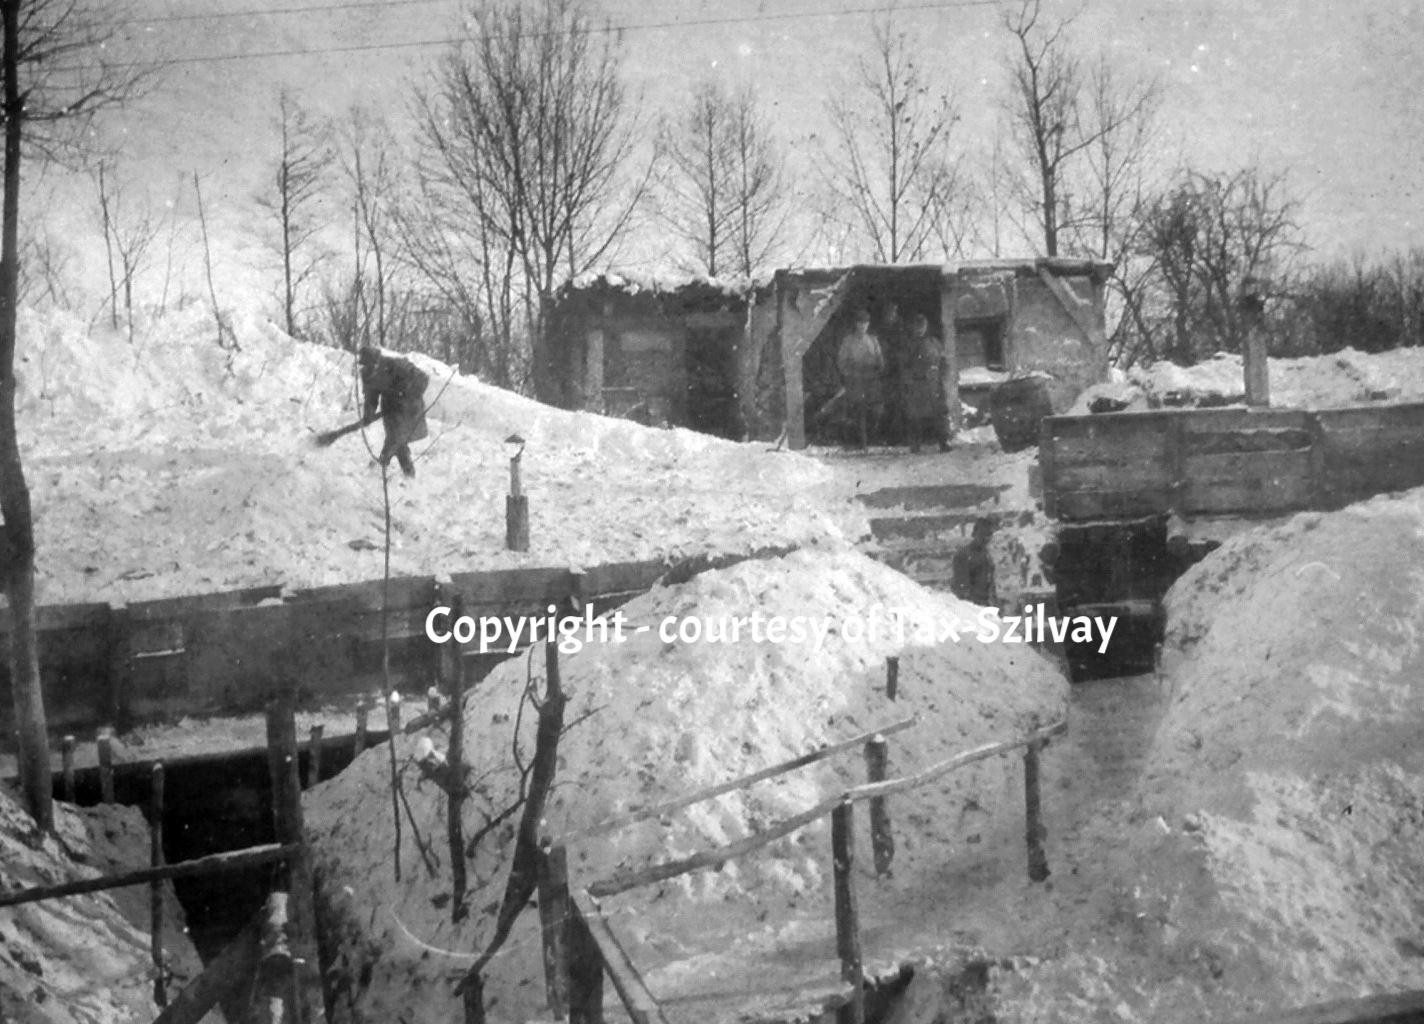 Winter 1916, Strypafront/Dnestr